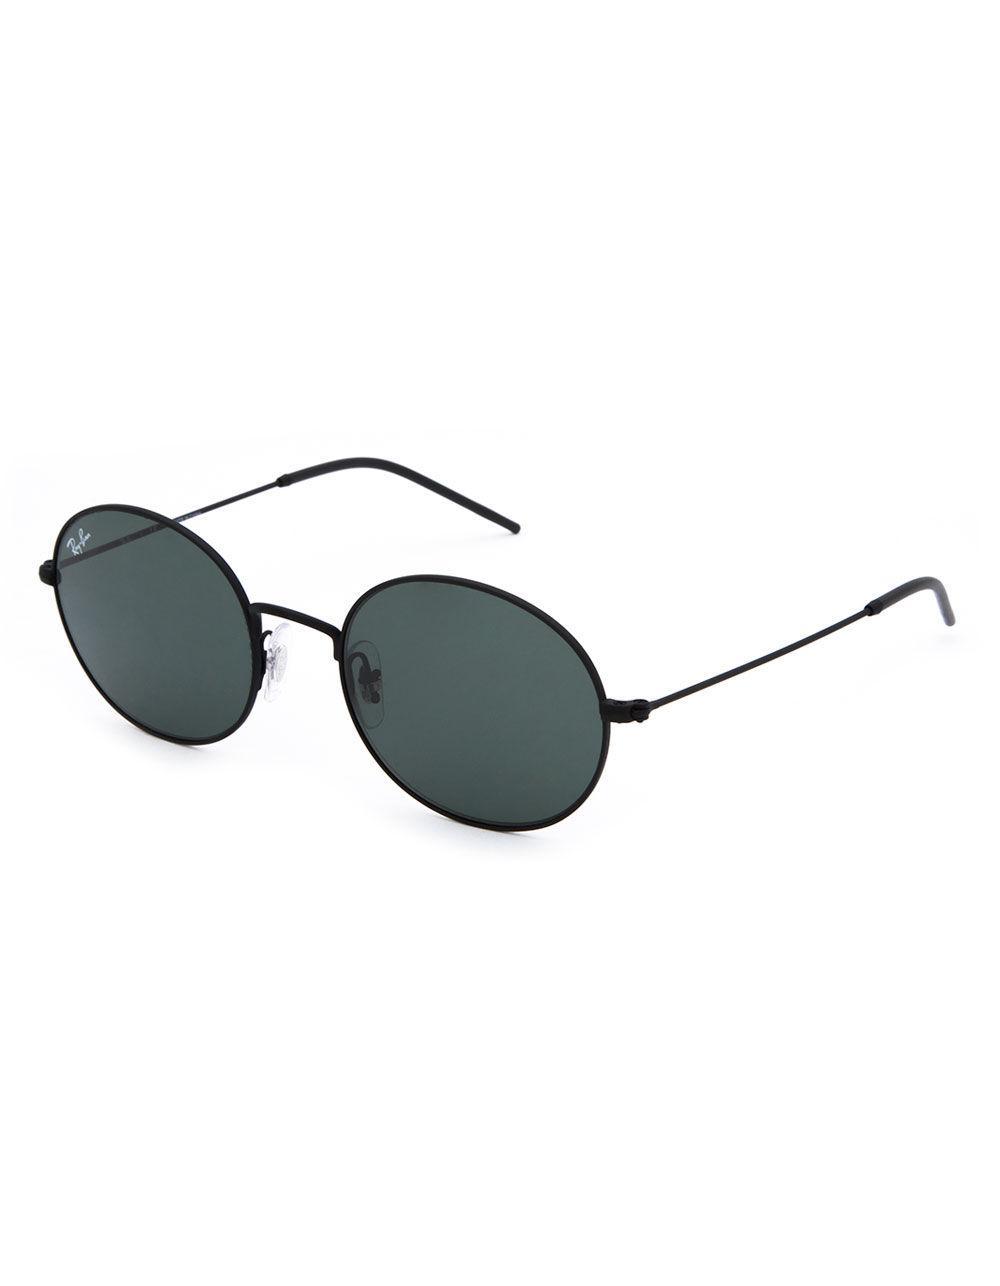 882812d0a3 ... Lyst - Ray-Ban Beat Sunglasses in Black good service 58c4e ecd5f ...